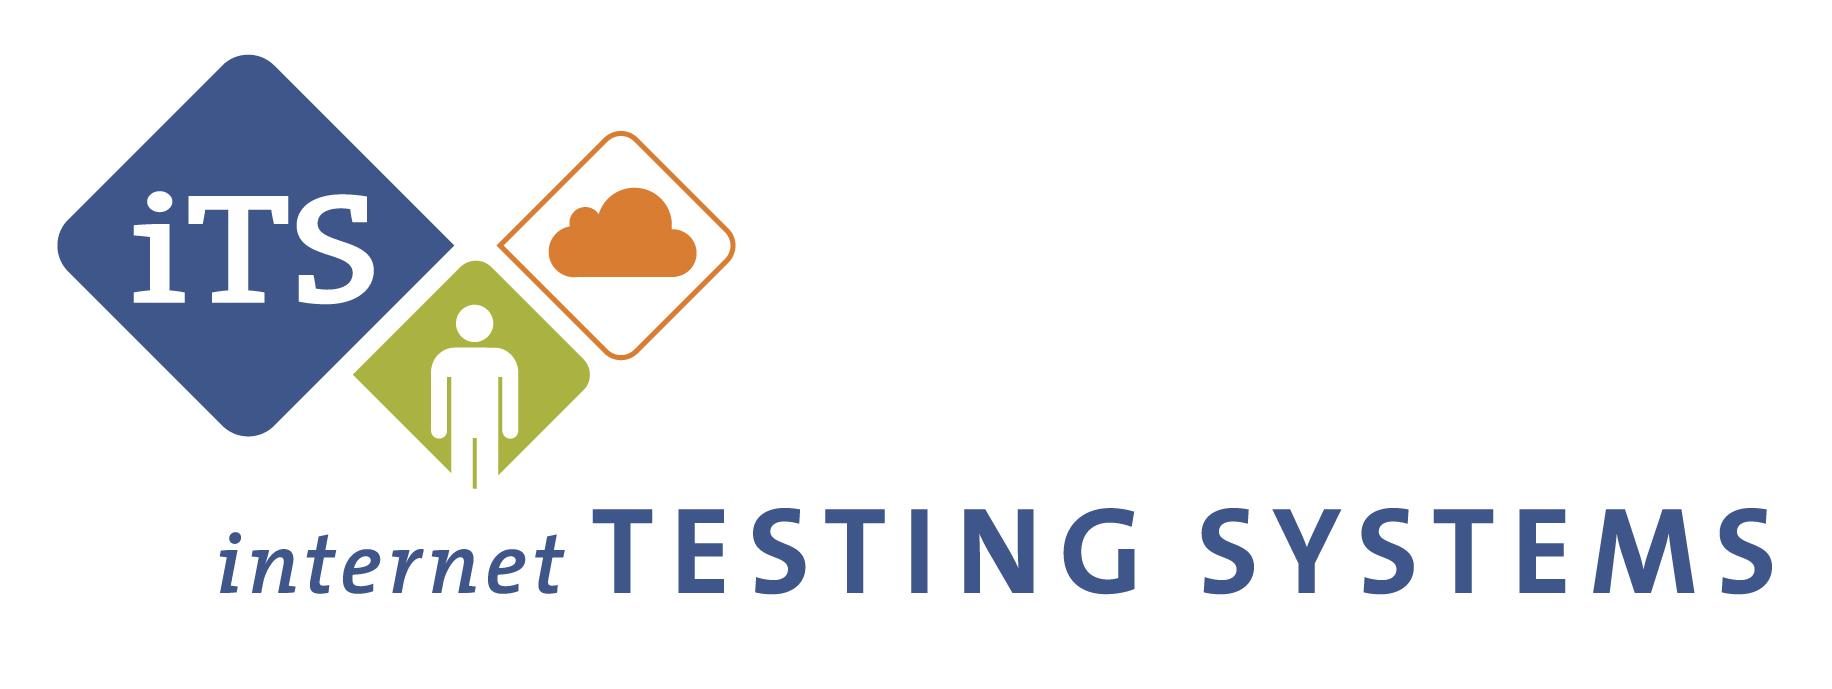 Internet Testing Systems Company Logo